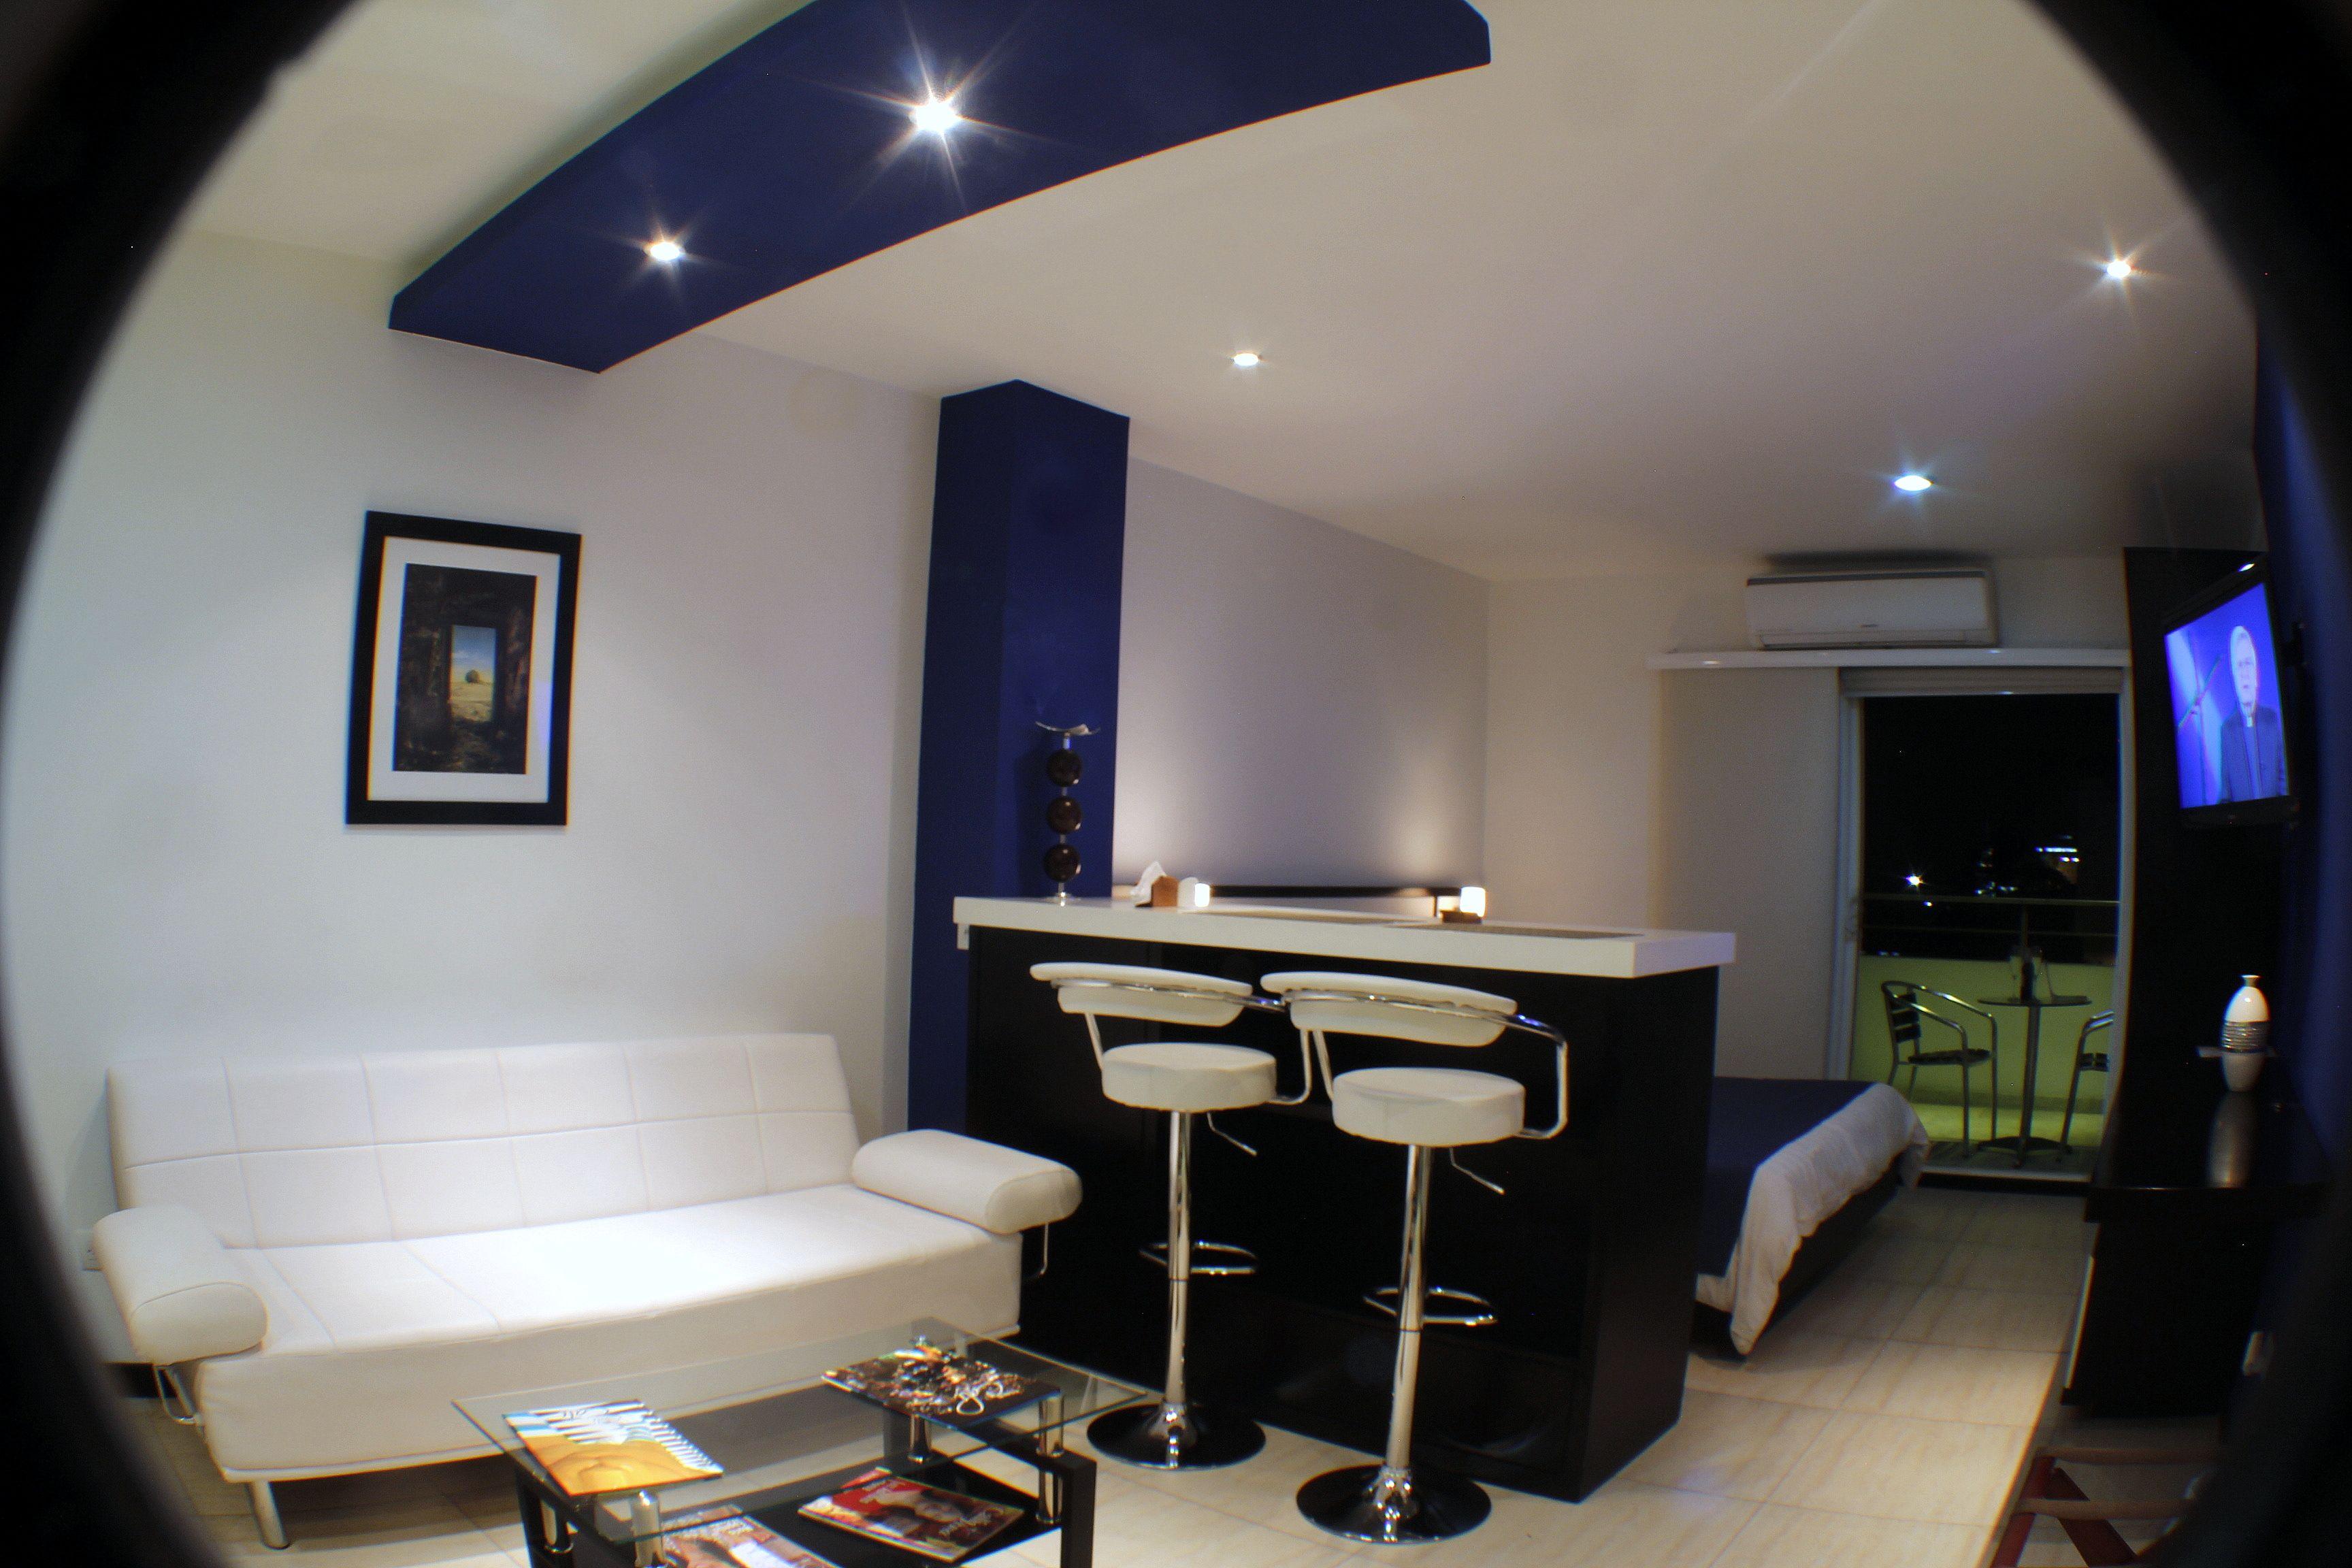 Loft Suite en 2 ambientes